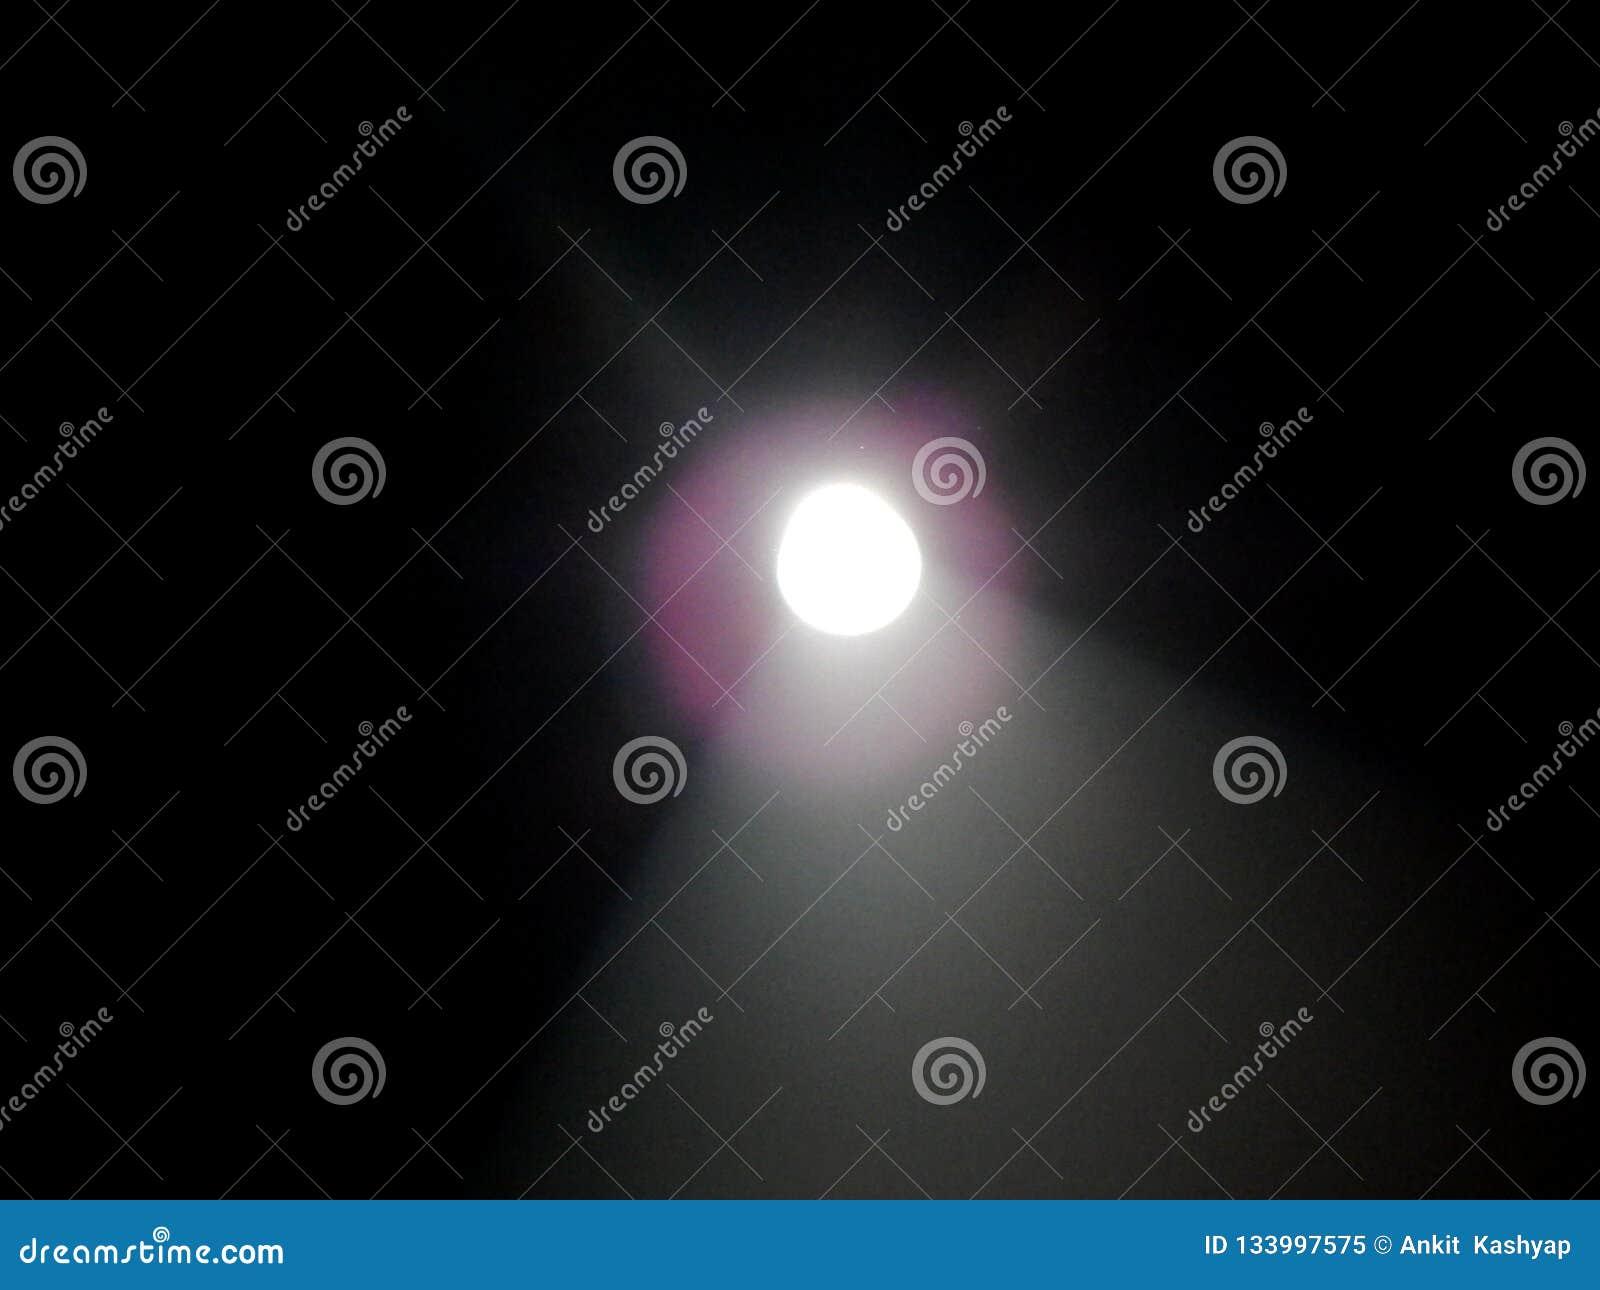 Focusing light coming into a dark room